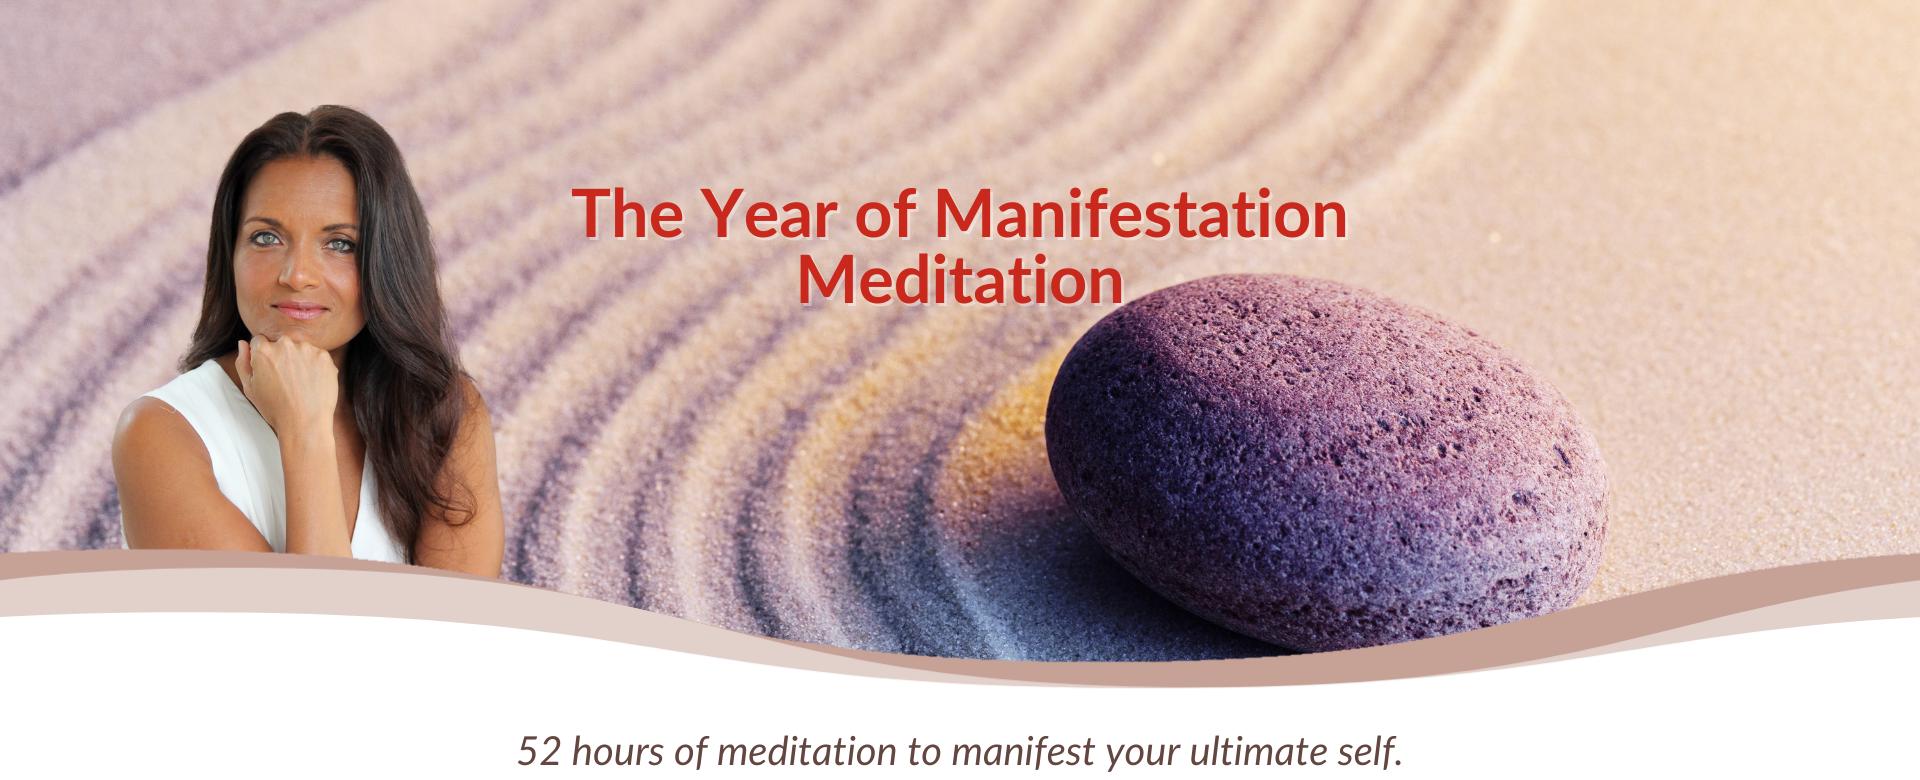 The Year of Manifestation Meditation